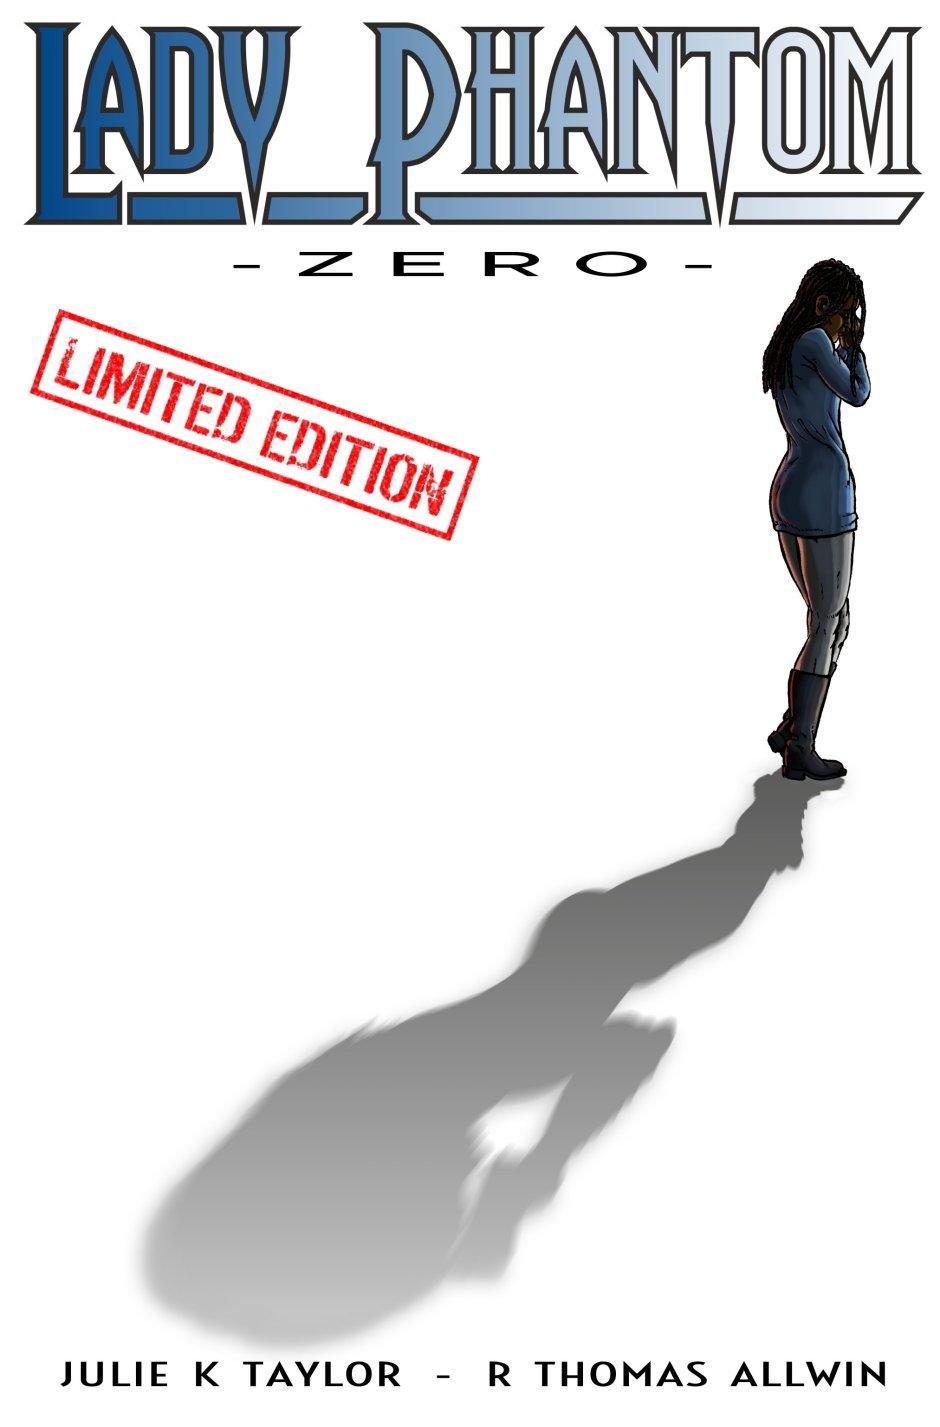 Lady Phantom Issue Zero, Limited Edition CL2000